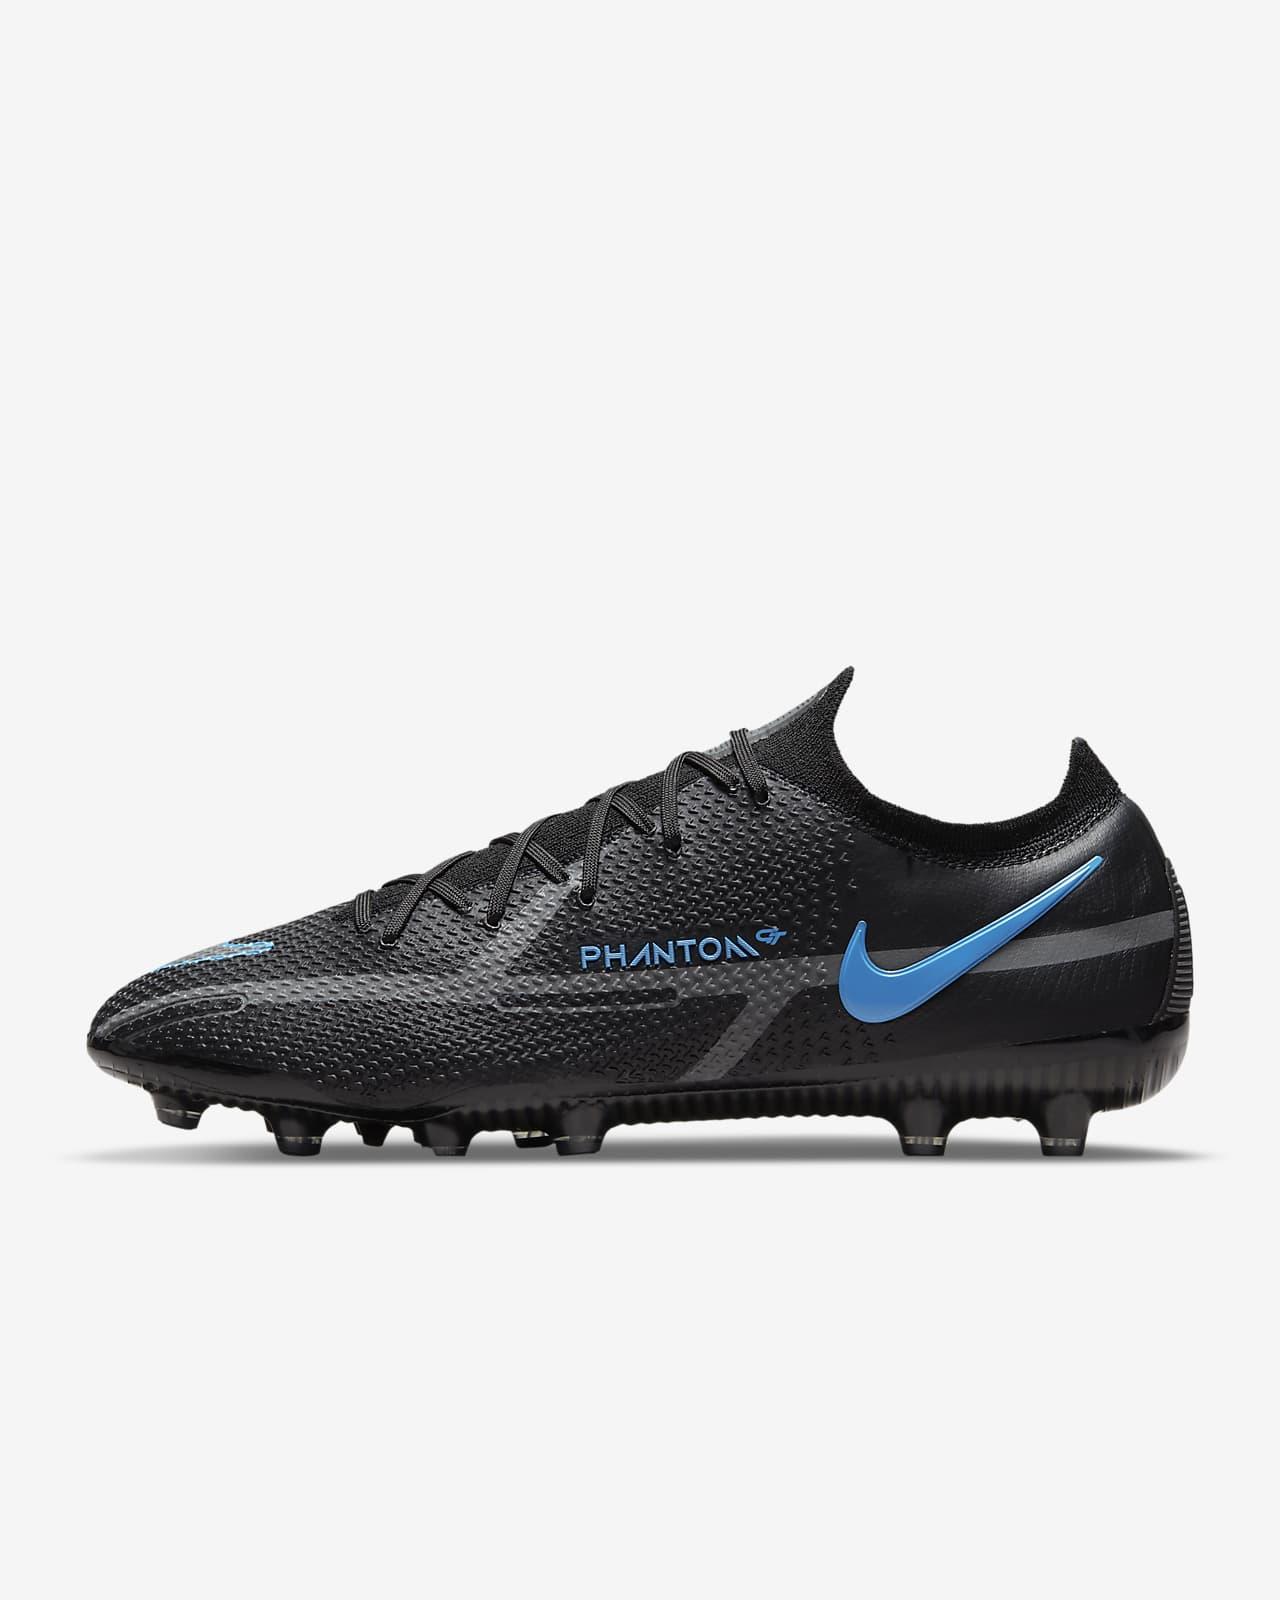 Nike Phantom GT2 Elite AG-Pro Artificial-Grass Football Boot